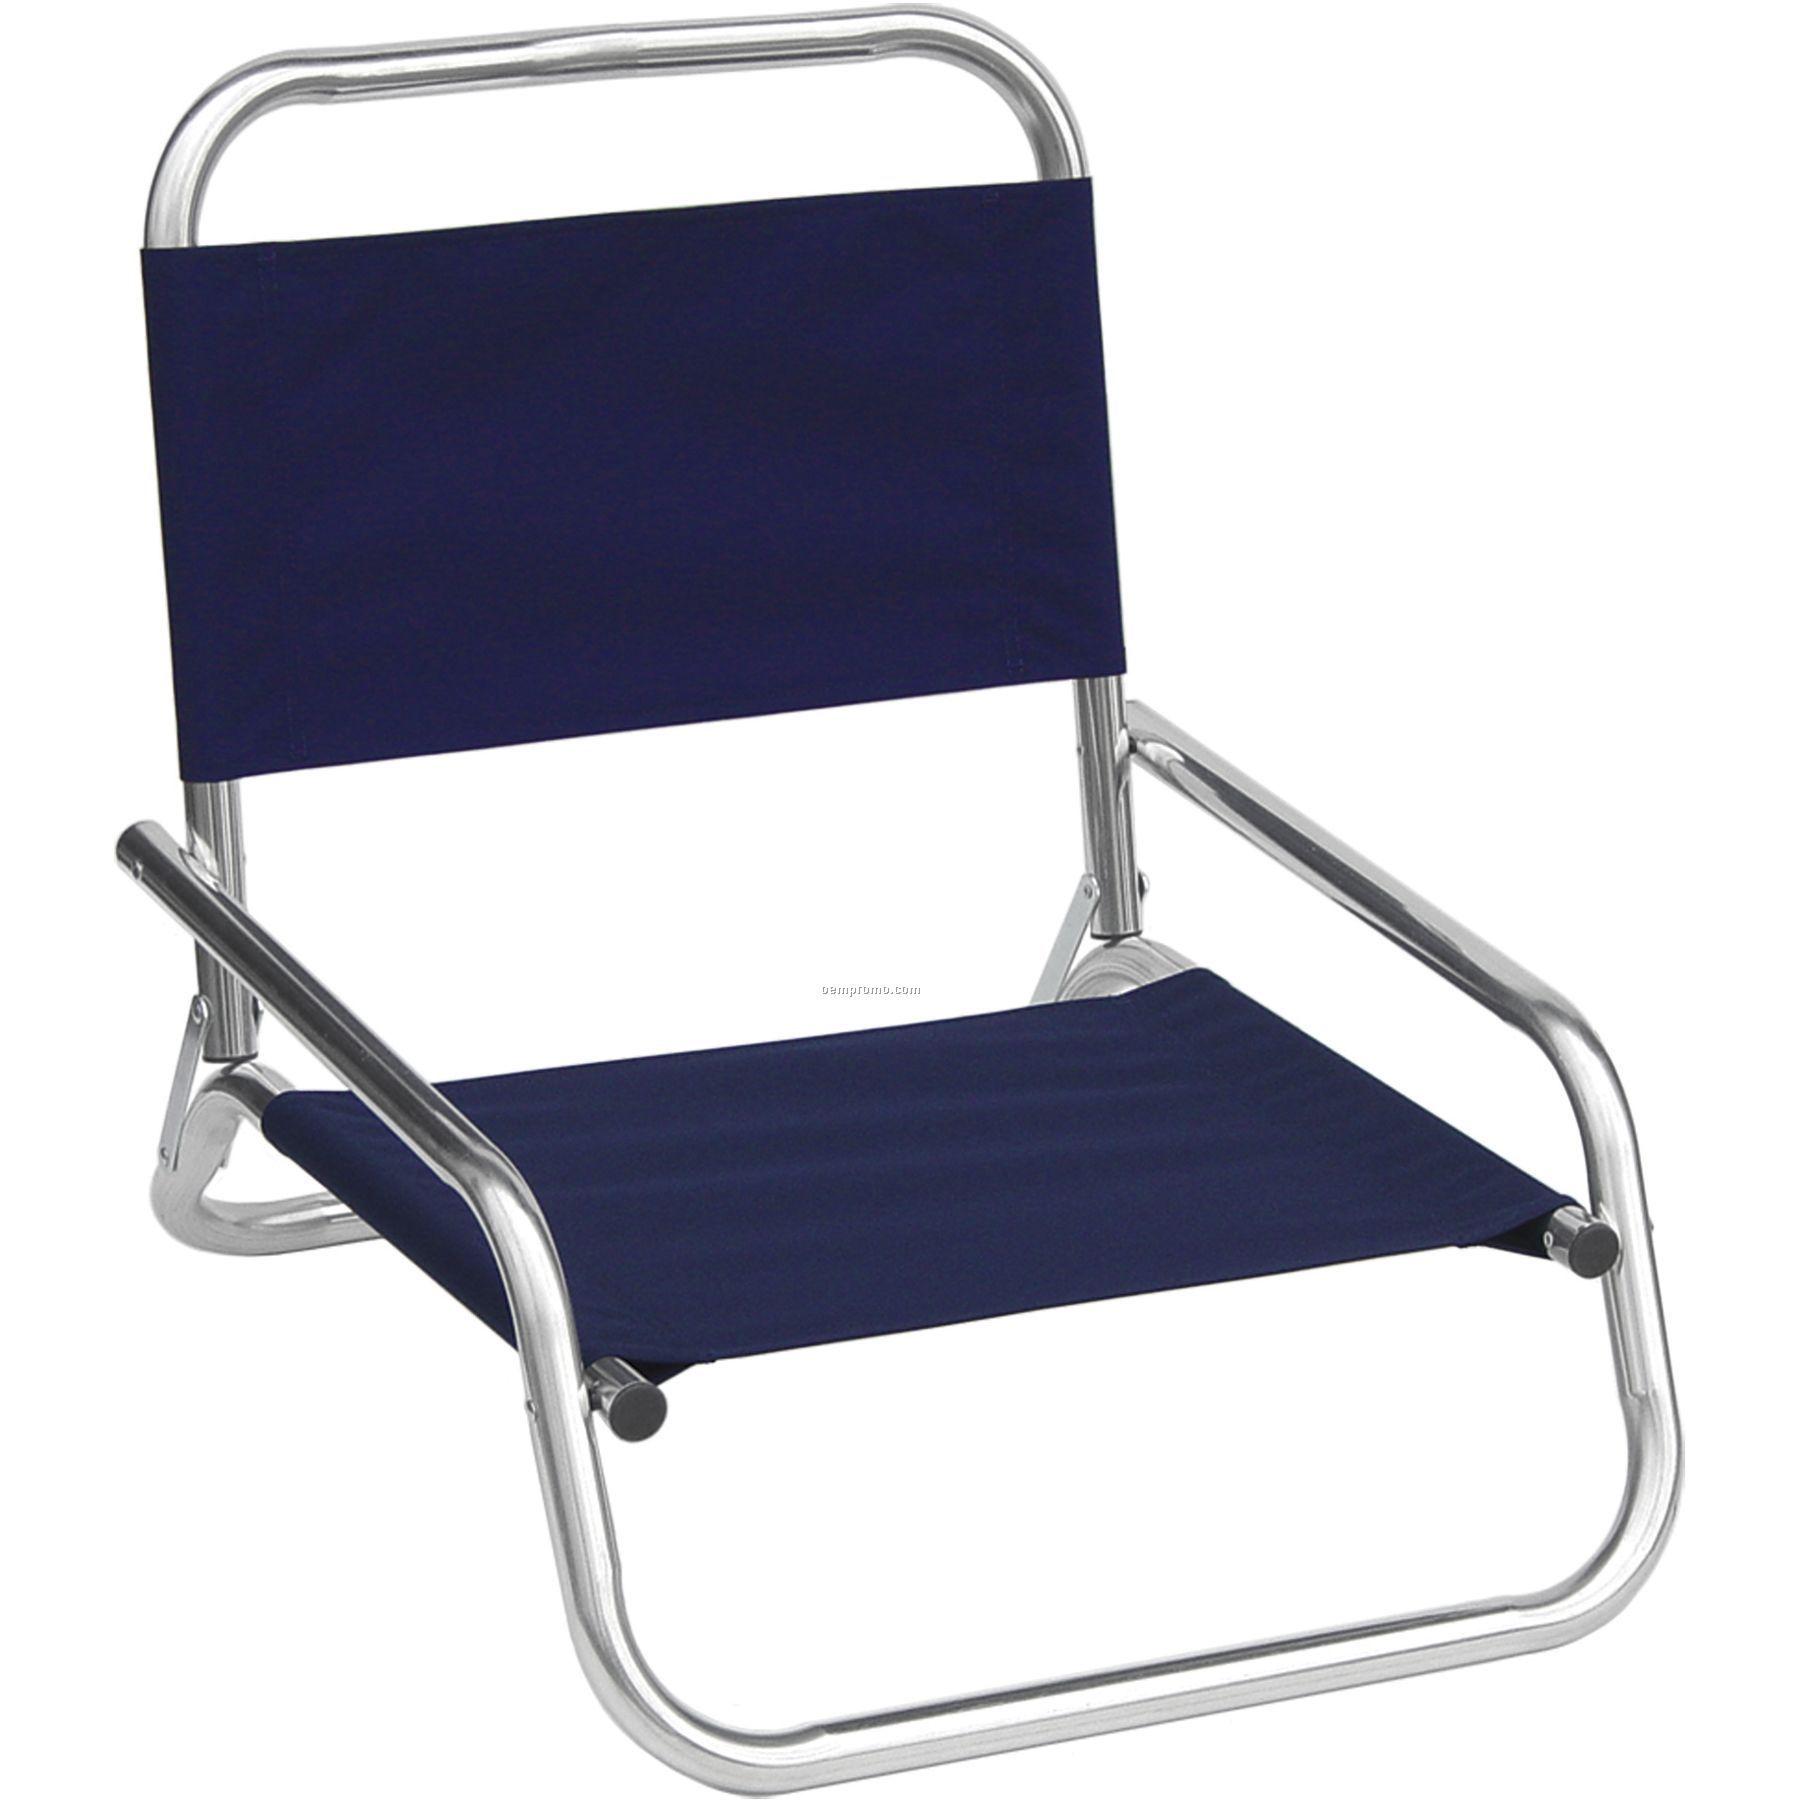 Ideal Low Folding Beach Chair , Low Price Folding Beach